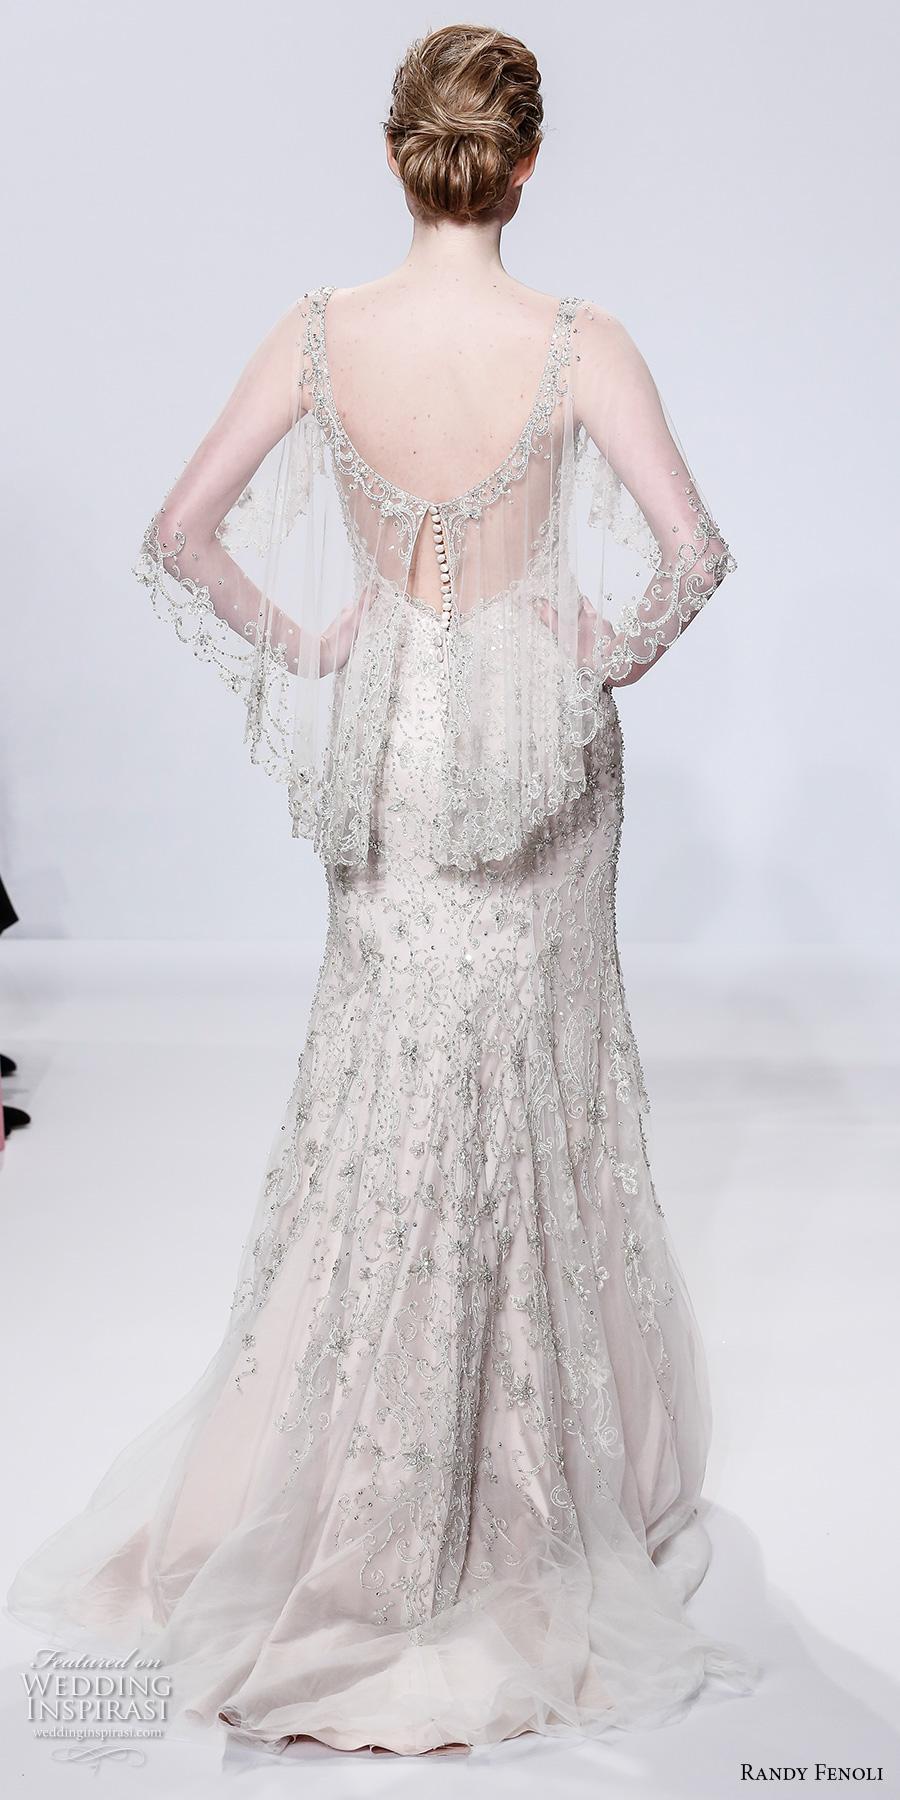 randy fenoli spring 2018 bridal sheer angel sleeves v neck full embellishment art deco glamorous elegant sheath wedding dress open scoop back sweep train (21) bv